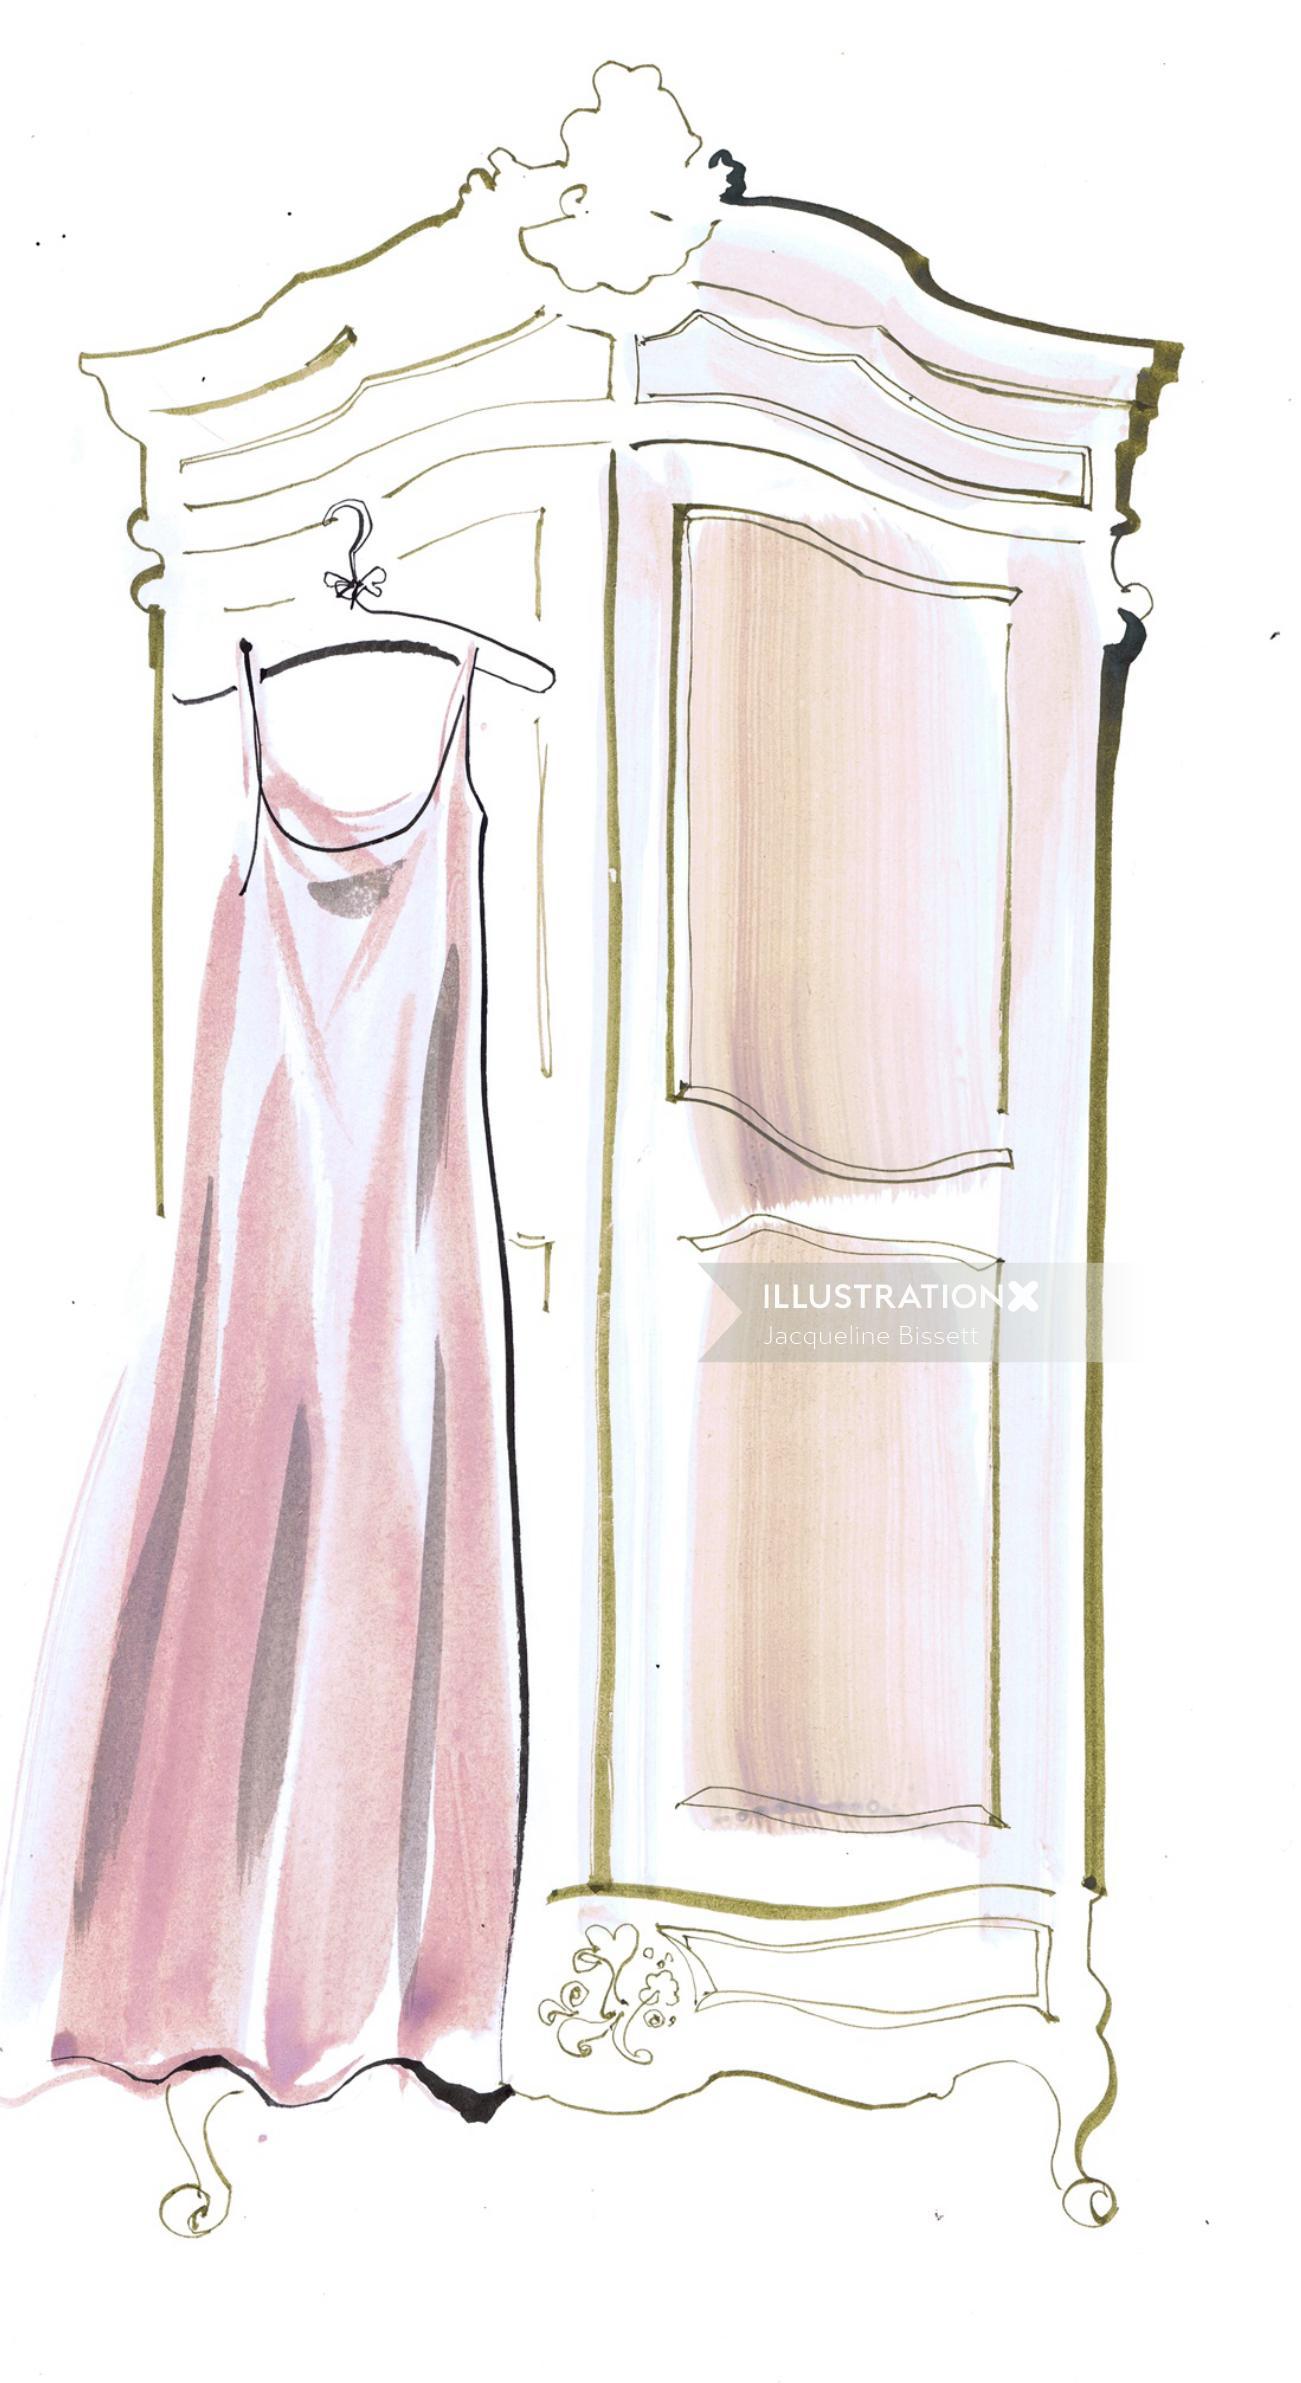 Rigby & Peller 2013 clothing